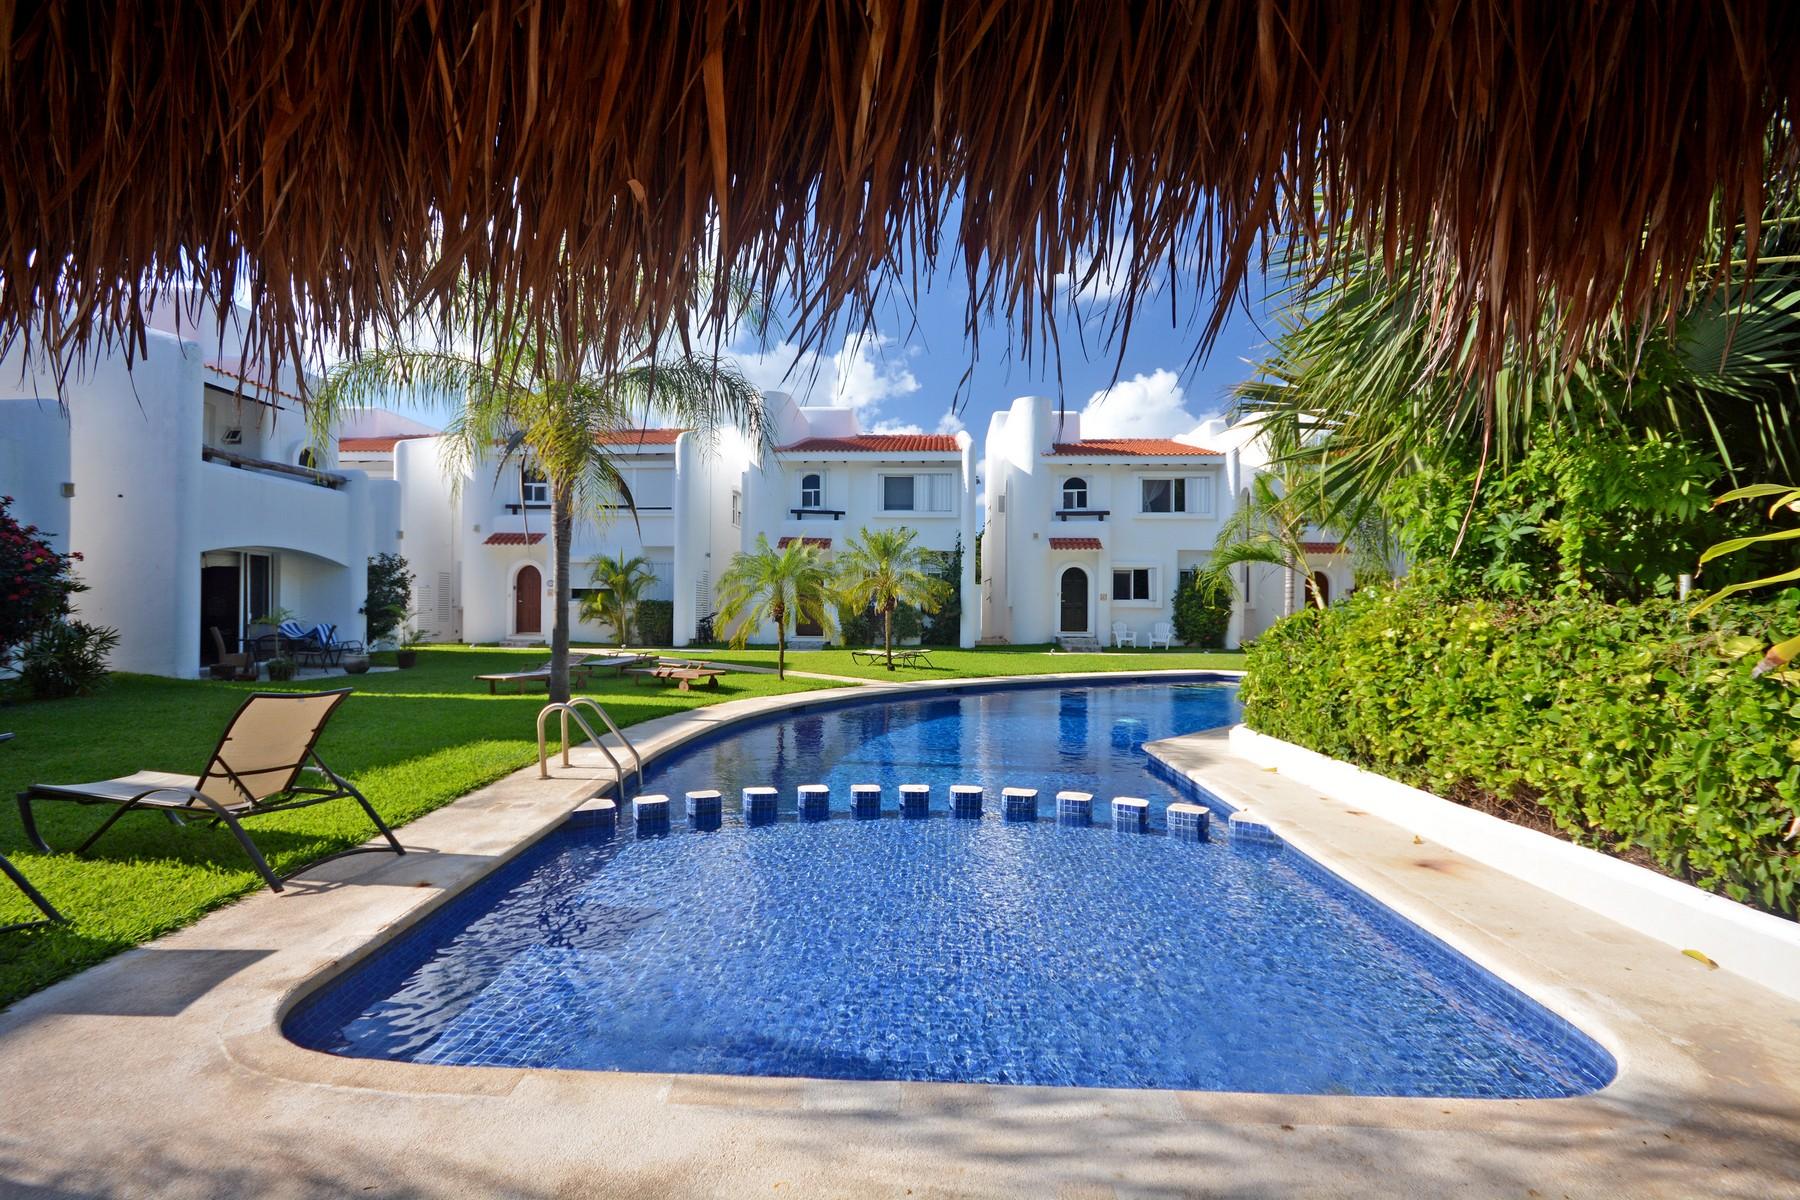 Single Family Home for Sale at INSPIRING CASA PALOMITA Playamar Playa Del Carmen, Quintana Roo, 77710 Mexico